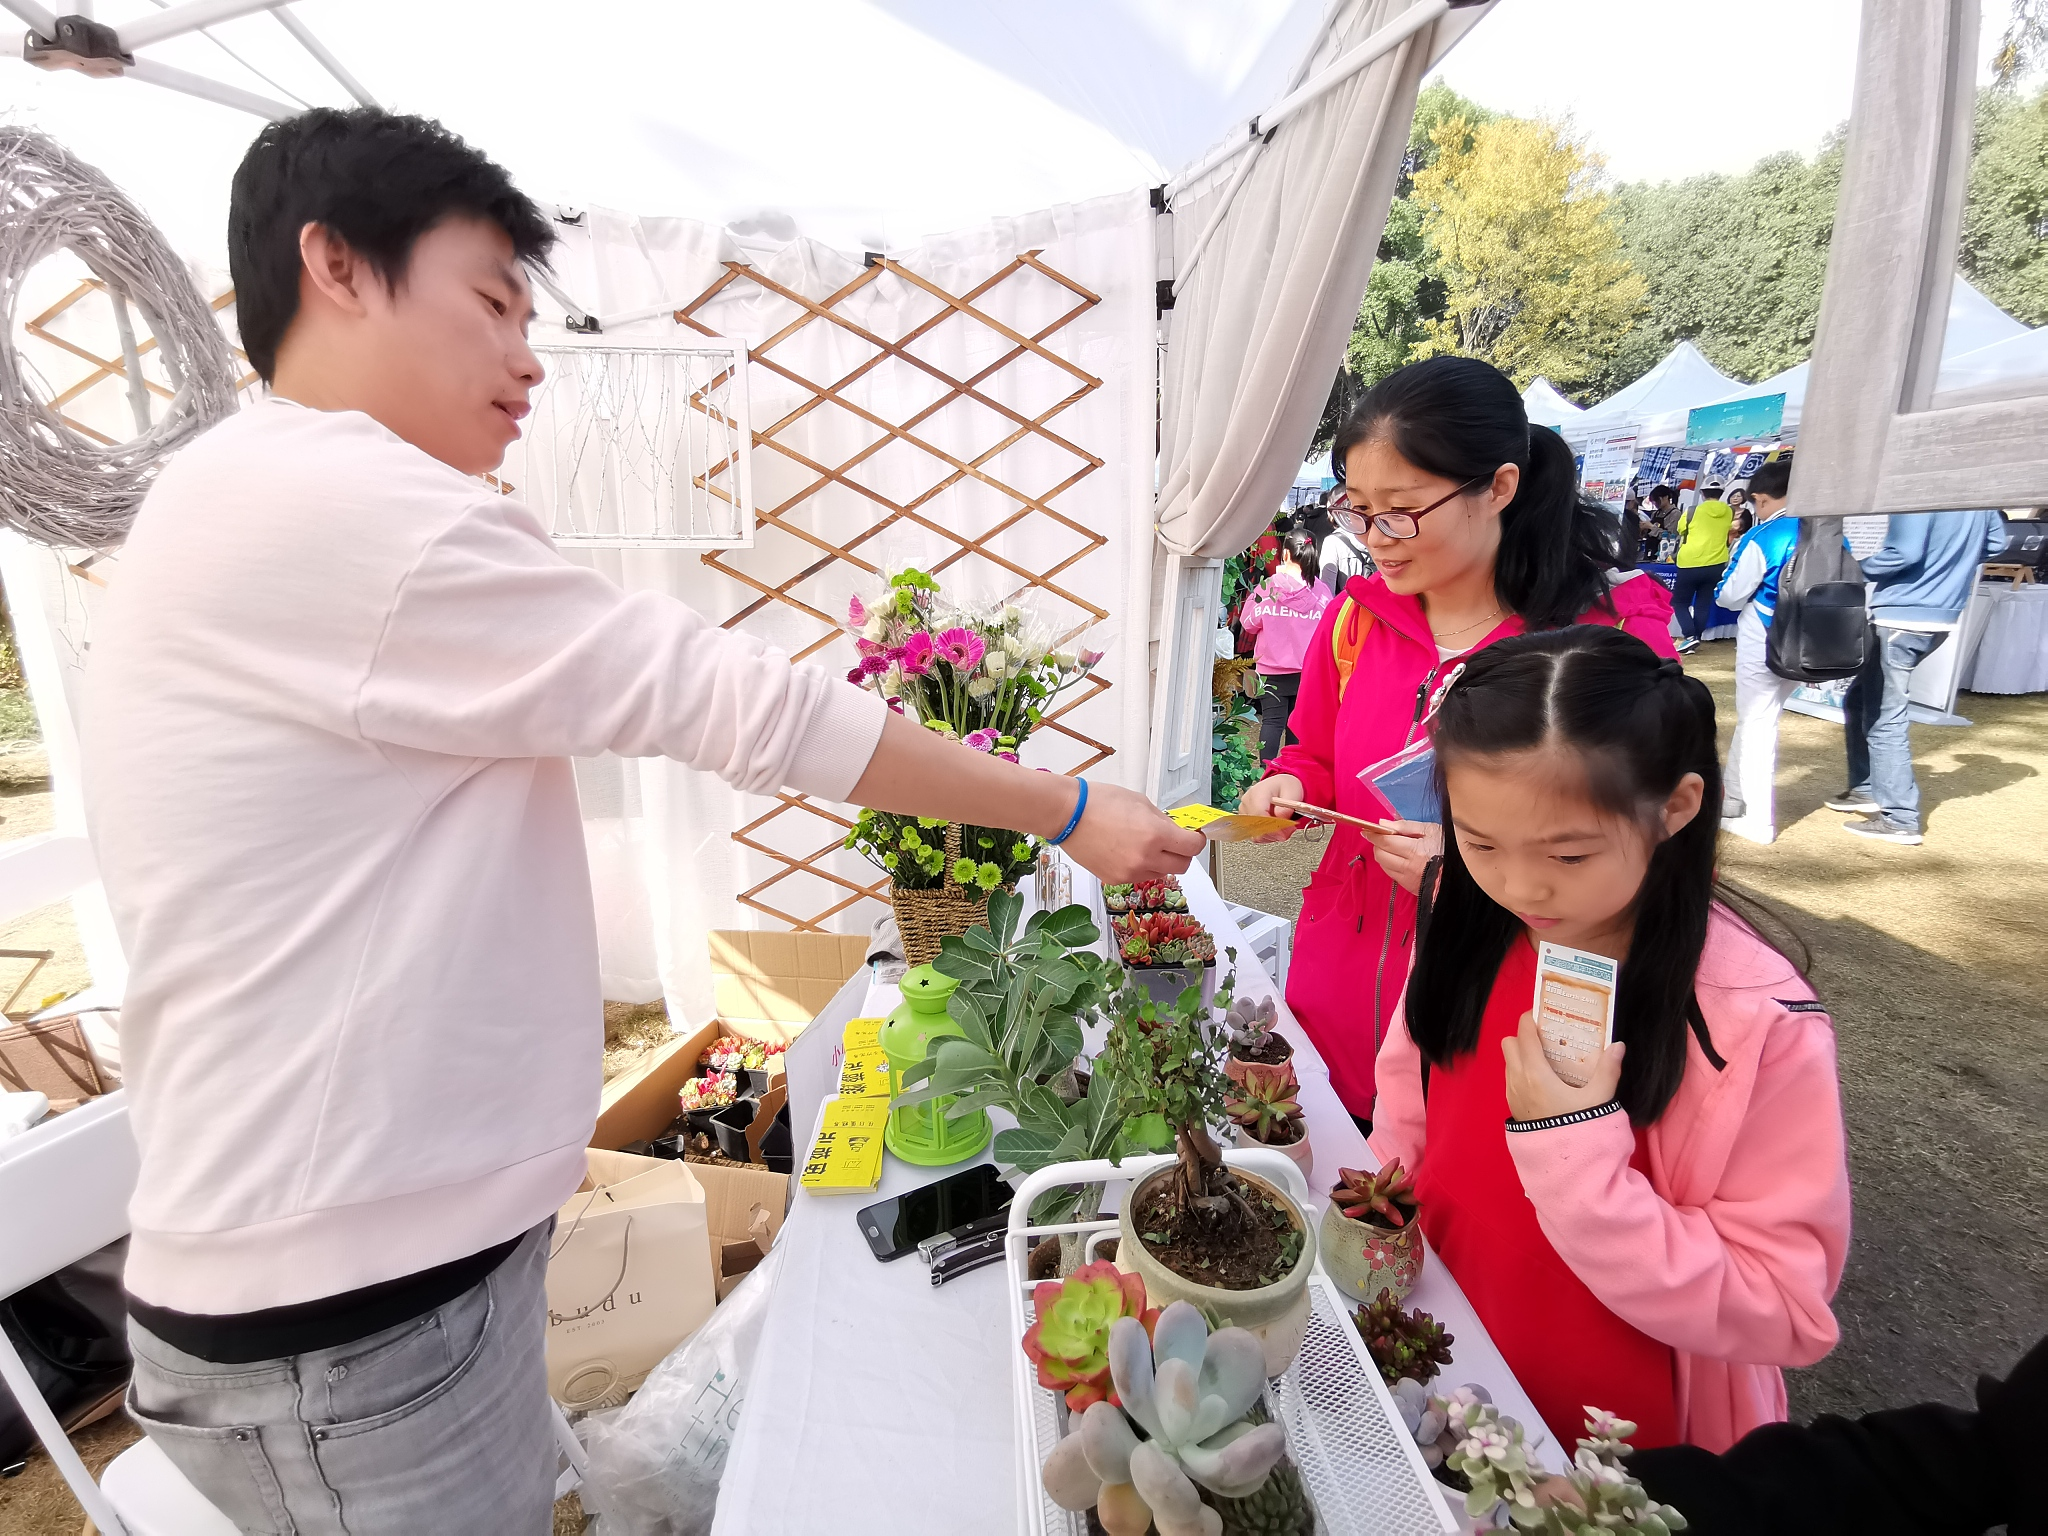 Nature Education underway in Wuhan Botanical Garden